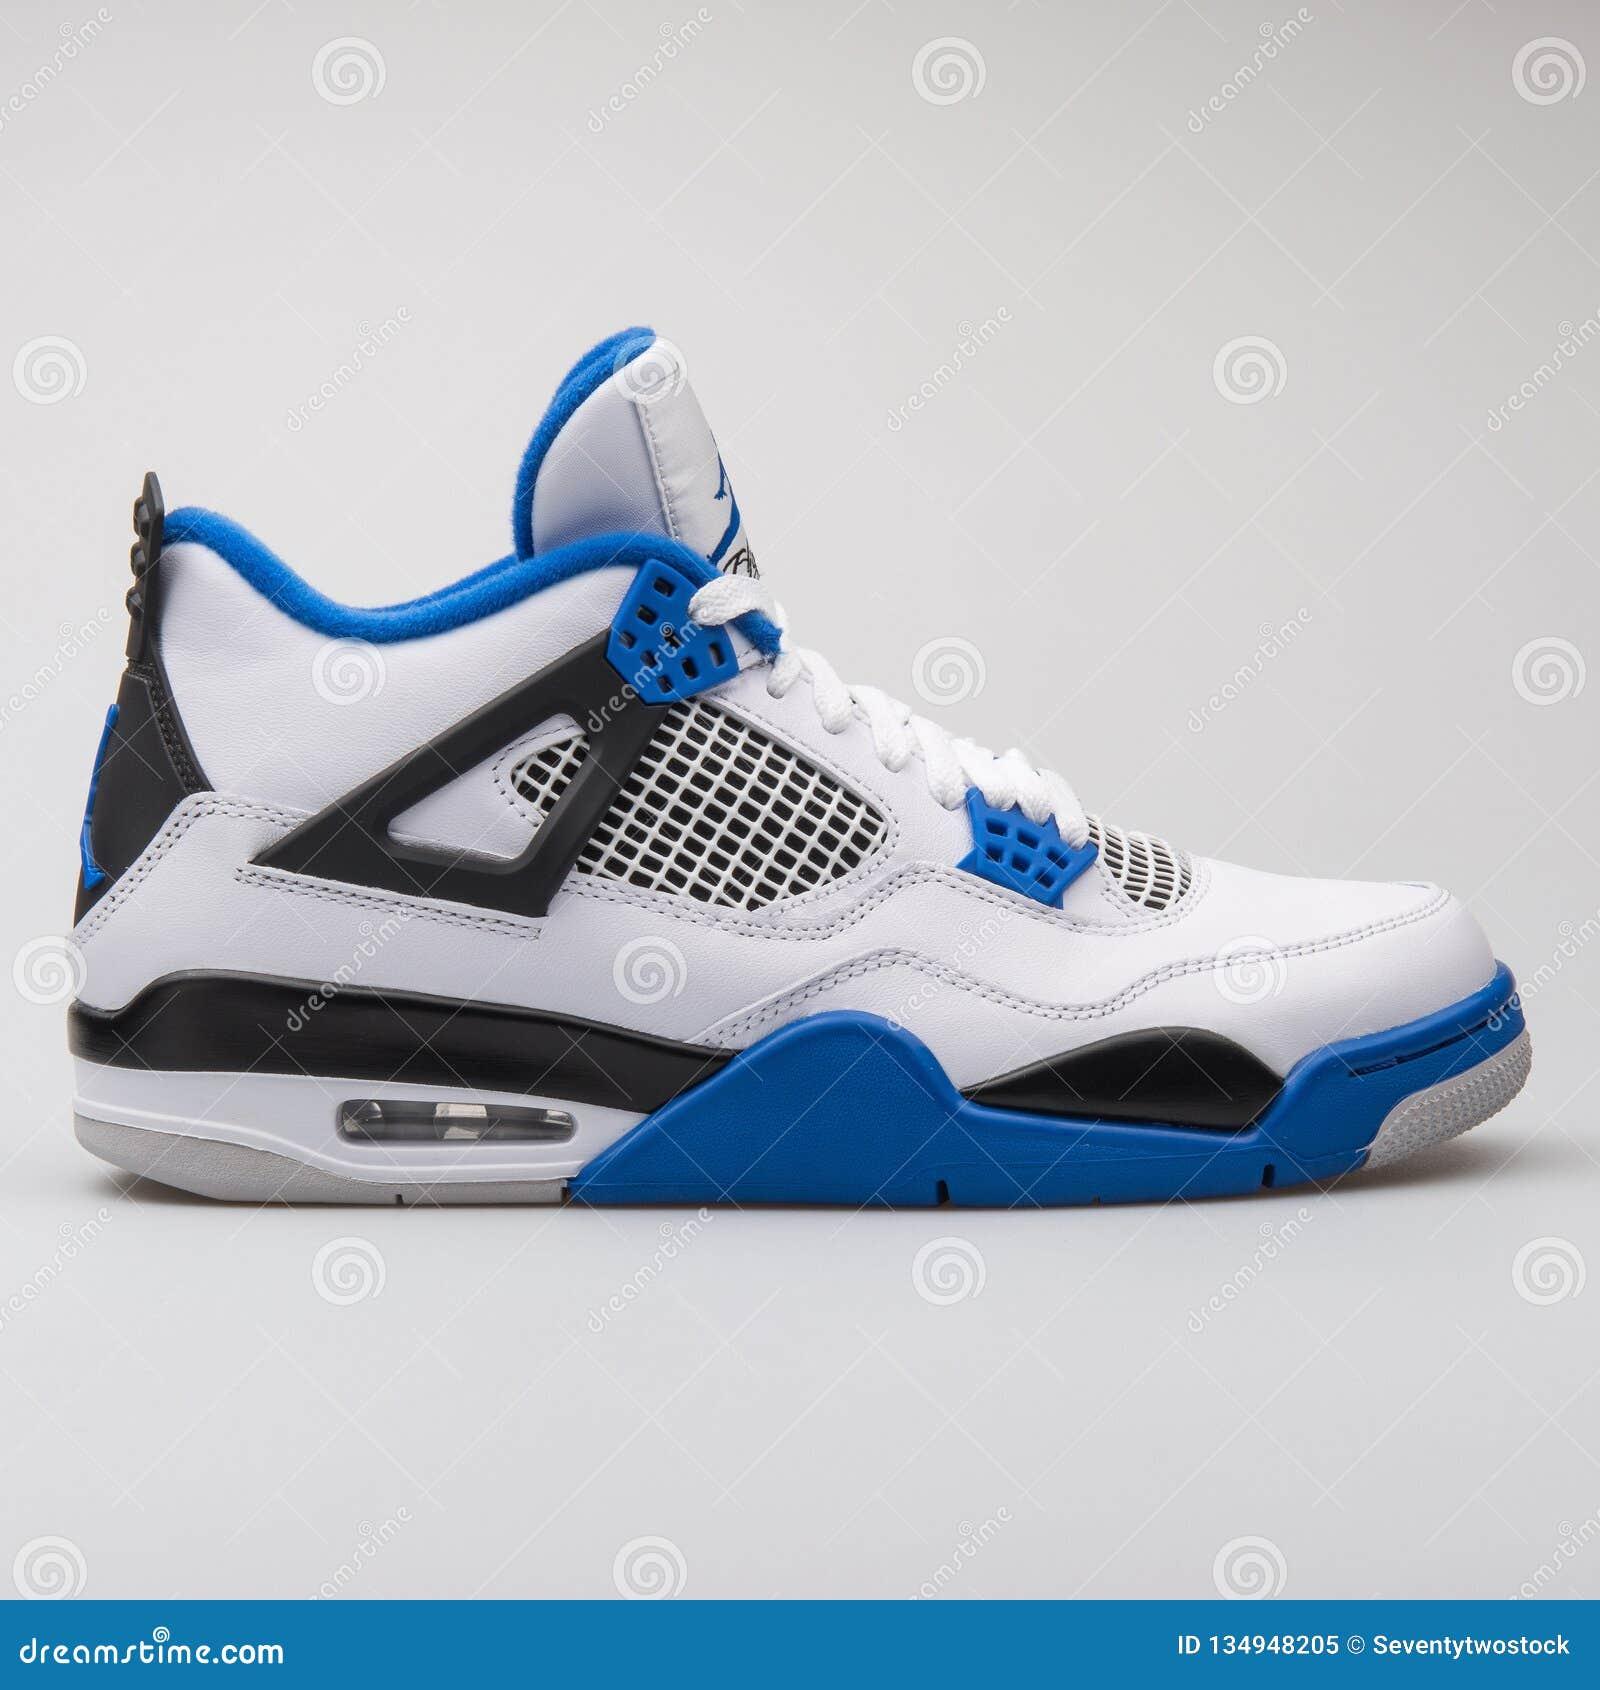 869c346871f5cb Nike Air Jordan 4 Retro White